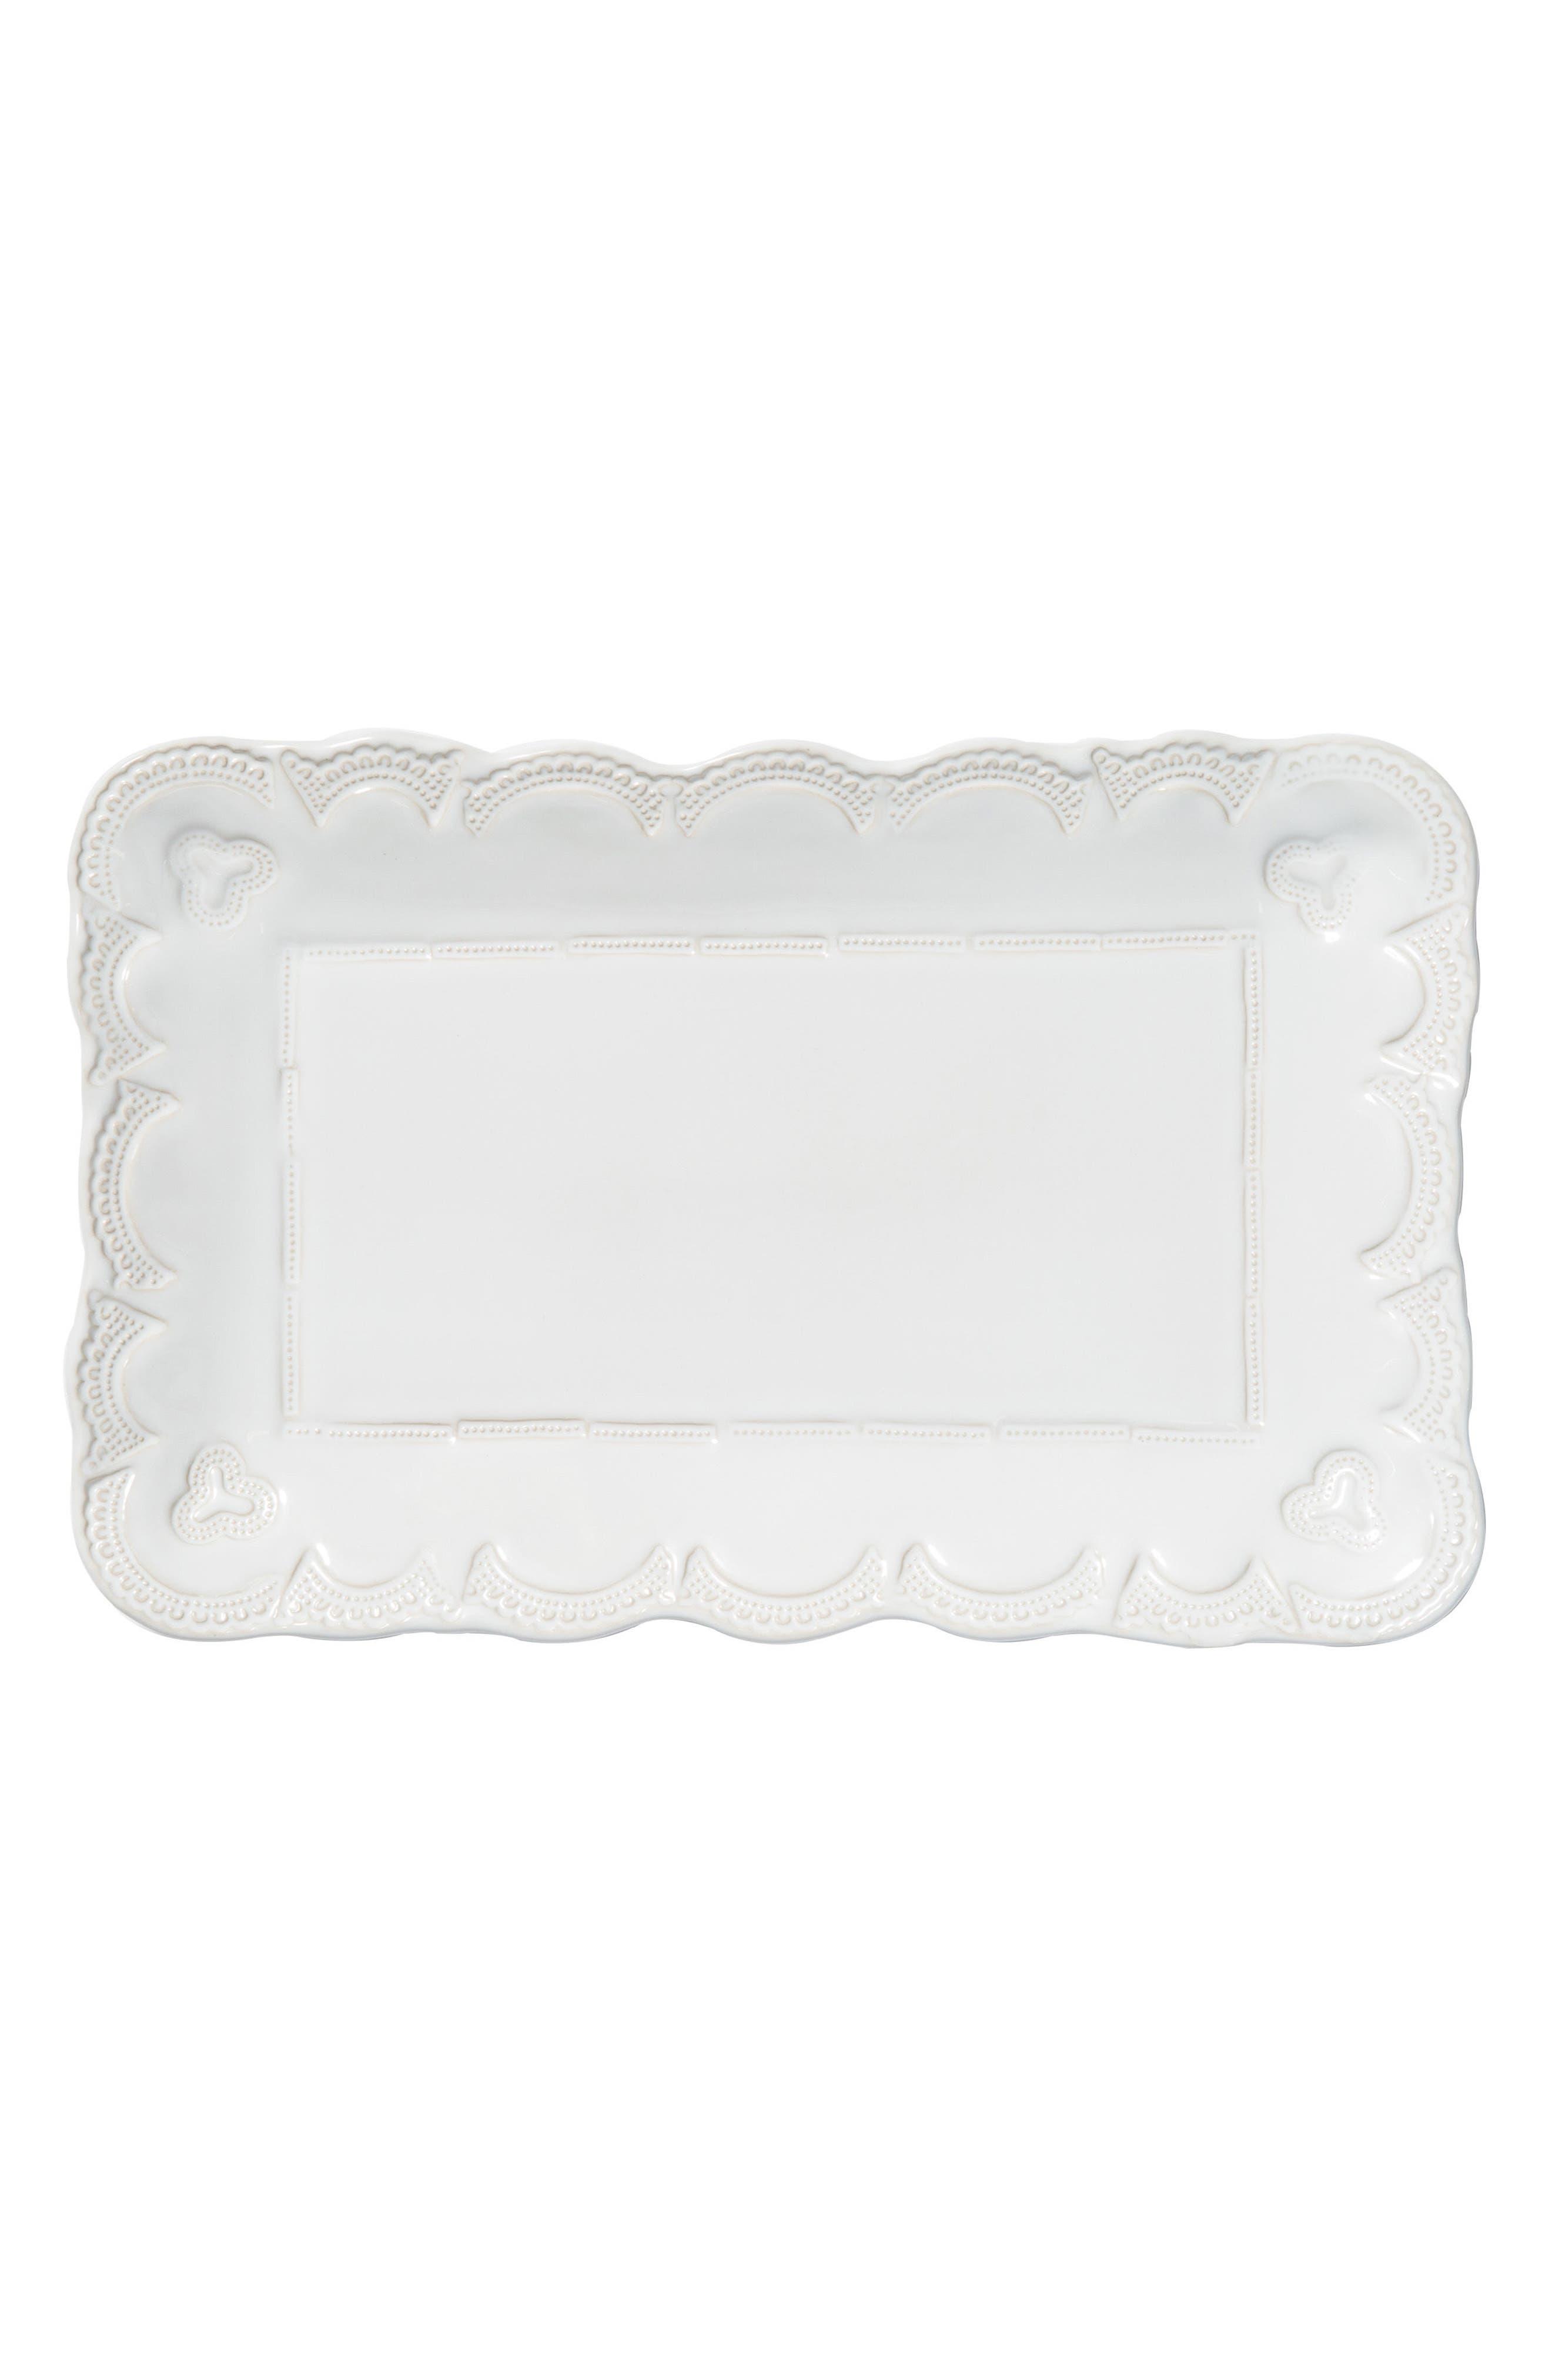 Incanto Stone Lace Small Serving Platter,                         Main,                         color, WHITE